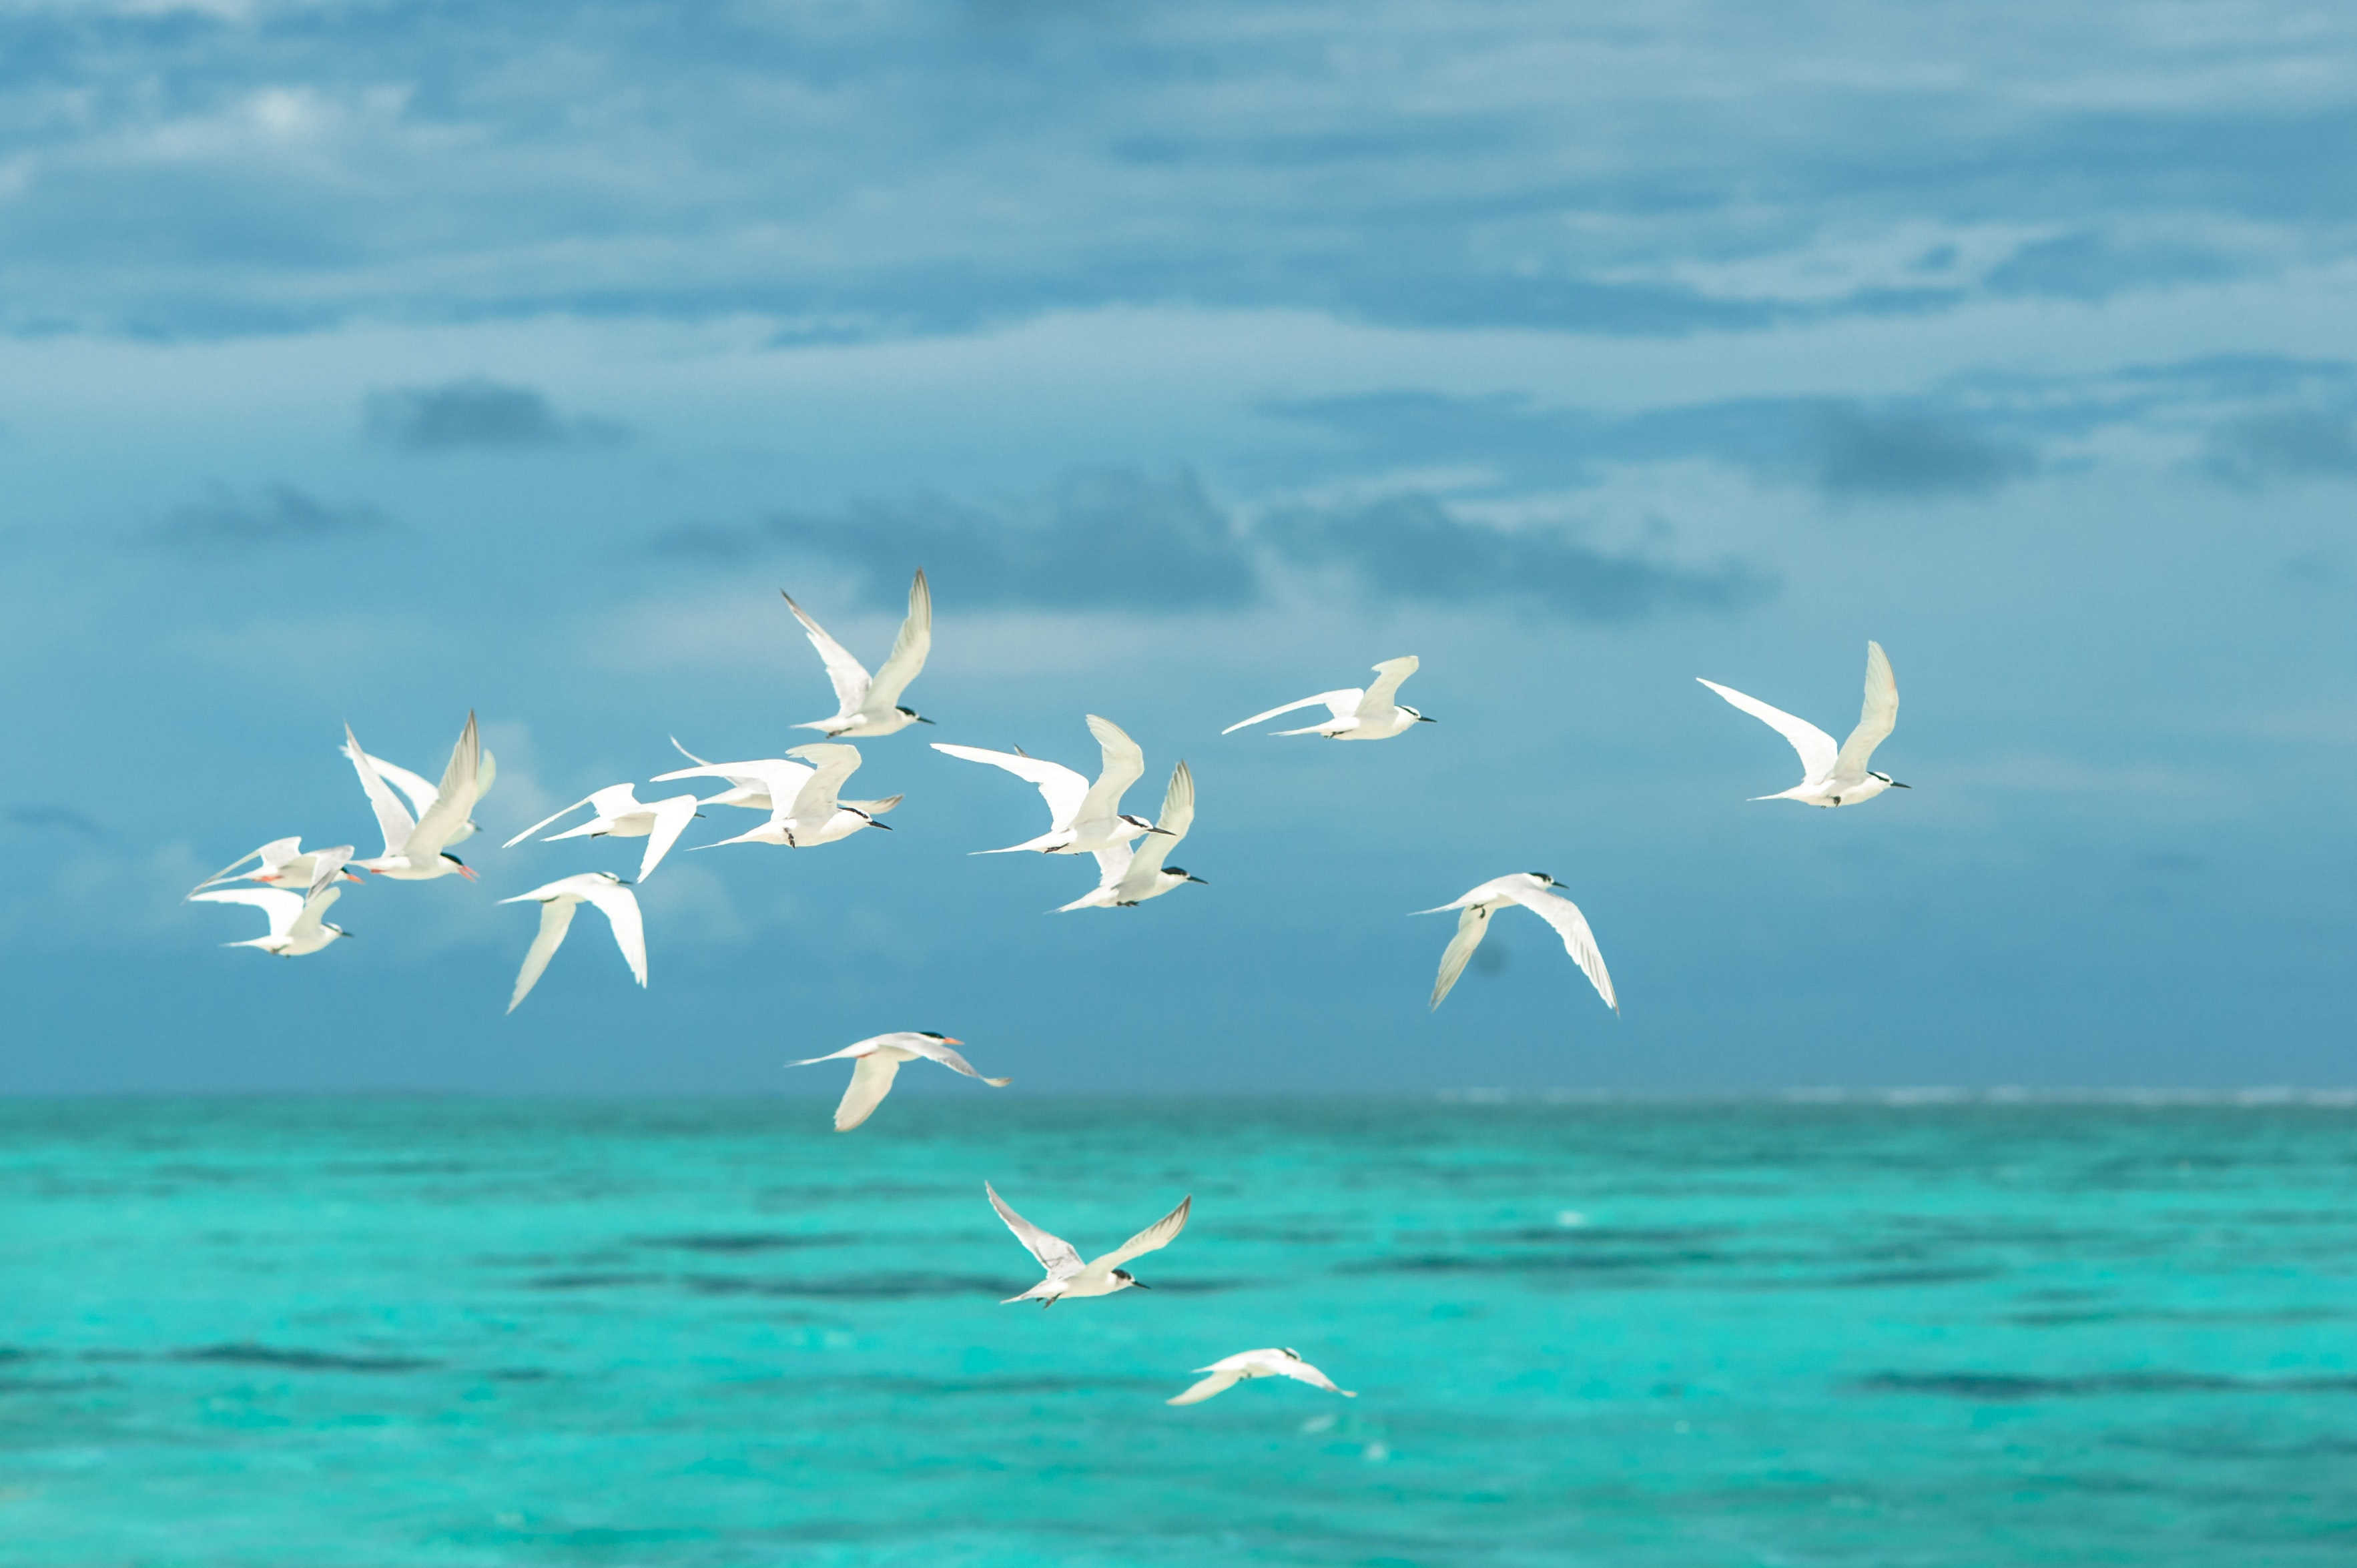 daytime-flock-of-birds-flying-1268874